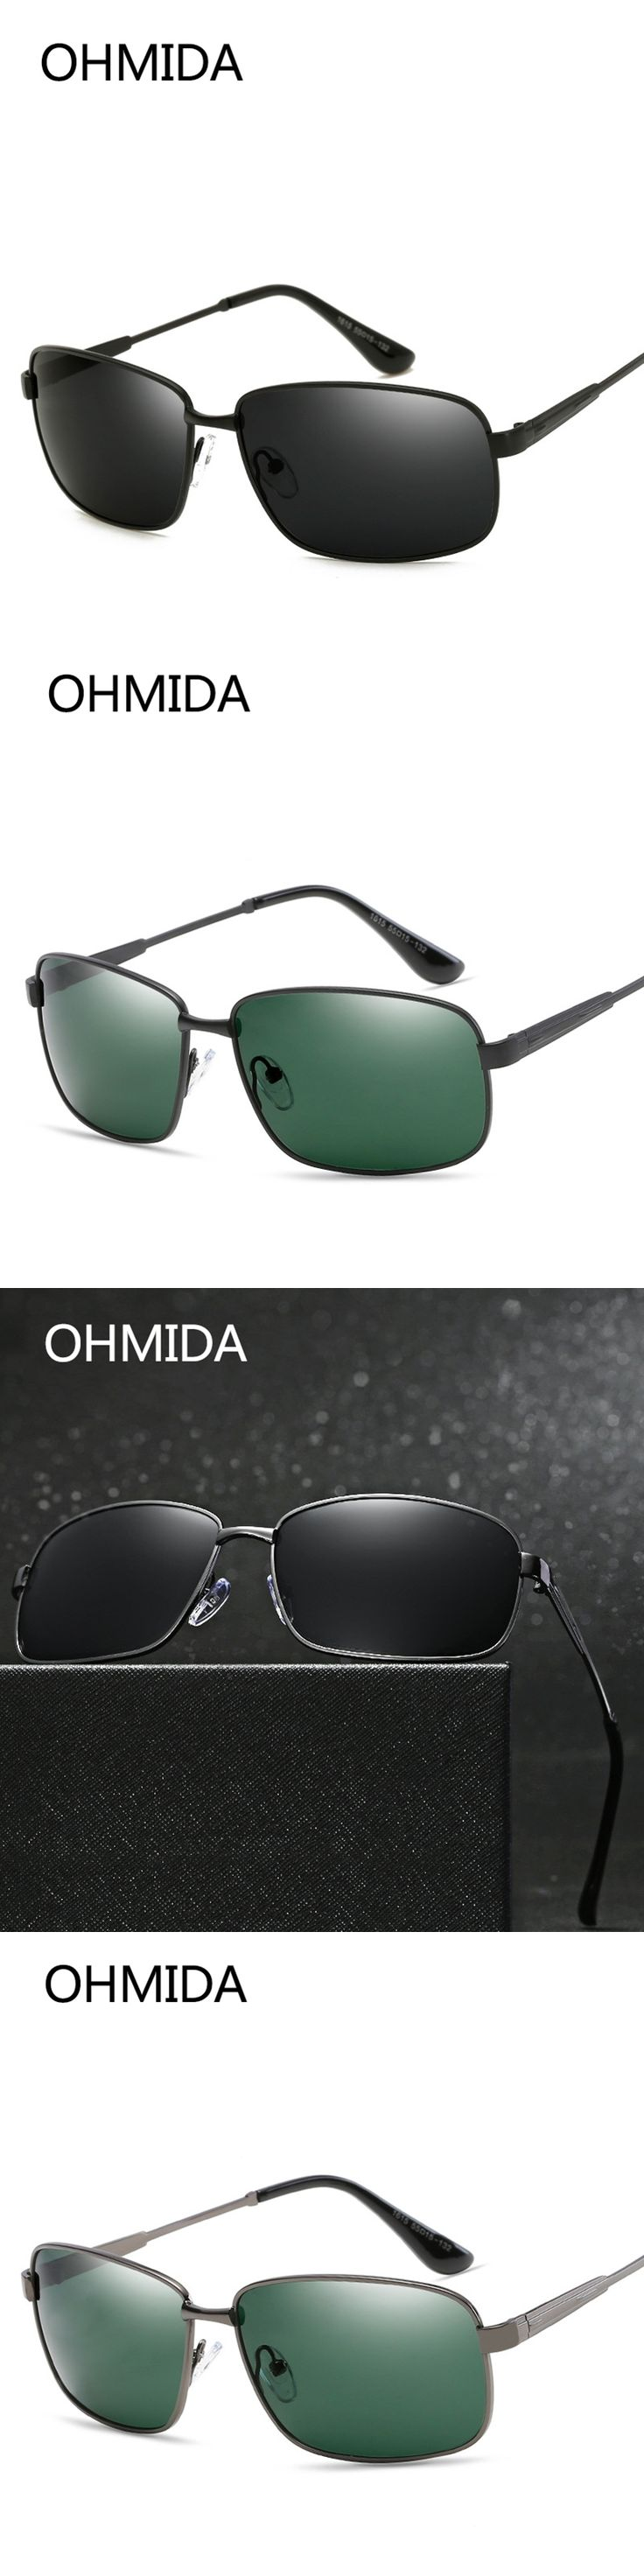 OHMIDA New Fashion Aviation Sunglasses Men HD Polarized Luxury Brands Vintage Sun Glasses Women Driver UV400 Men's Sunglass